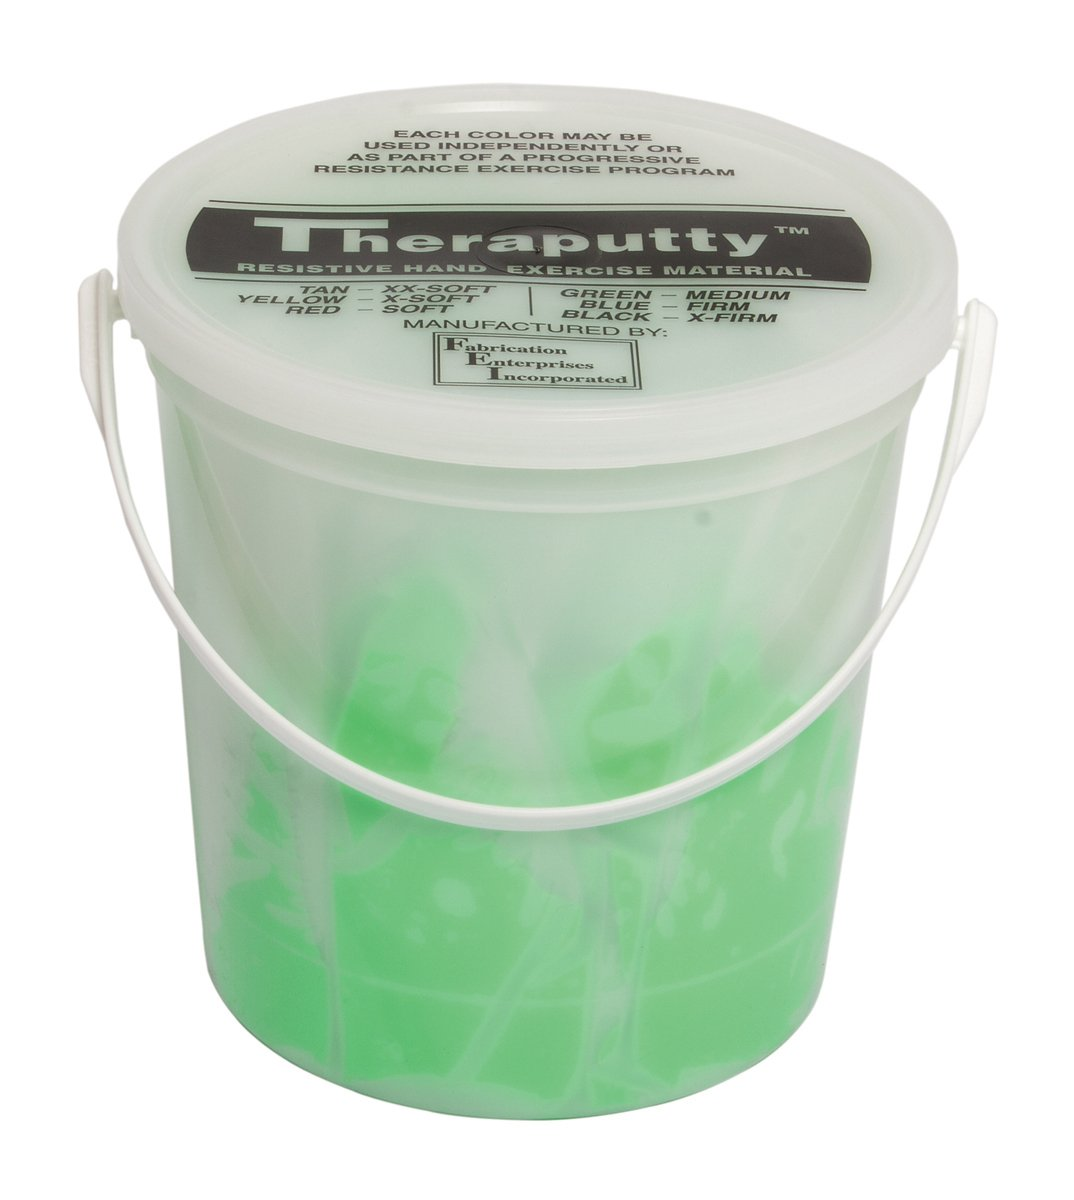 CanDo TheraPutty Plus Anti-microbial, Green: Medium, 5 lb